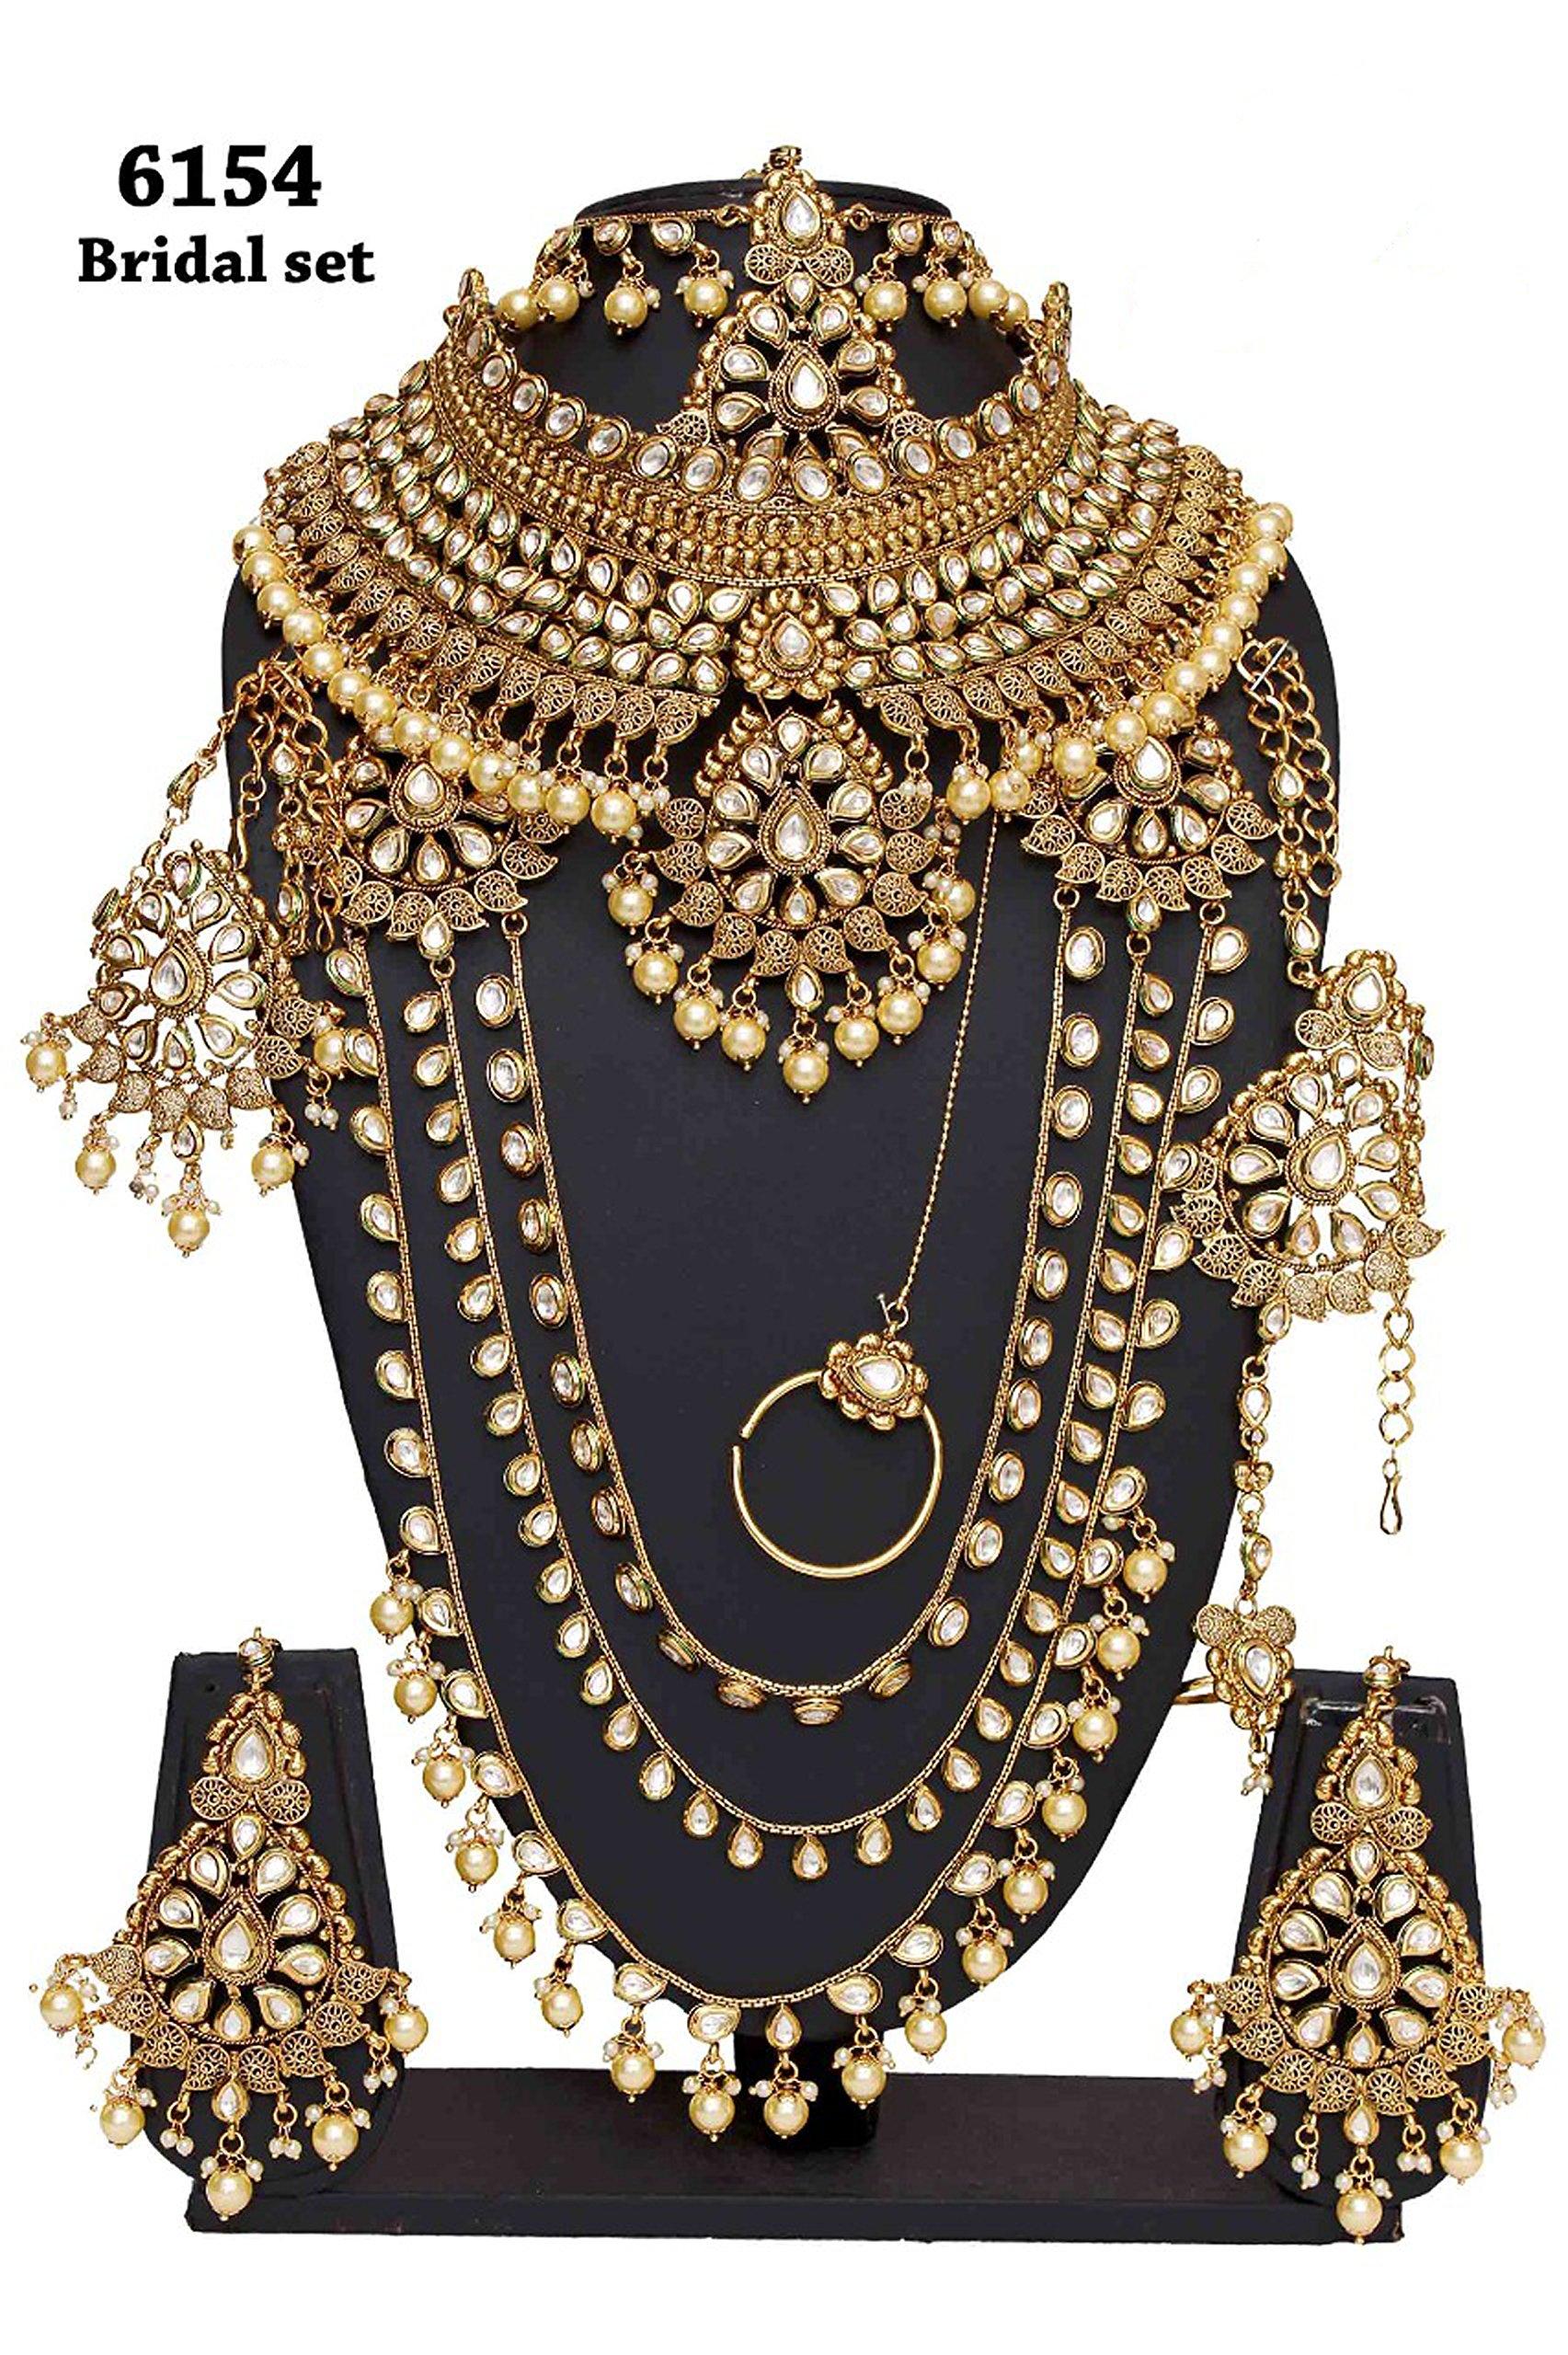 Womens Style Golden Plated Polki Kundan Stone Stone Indian Necklace Earrings Bridal Set Jewelry